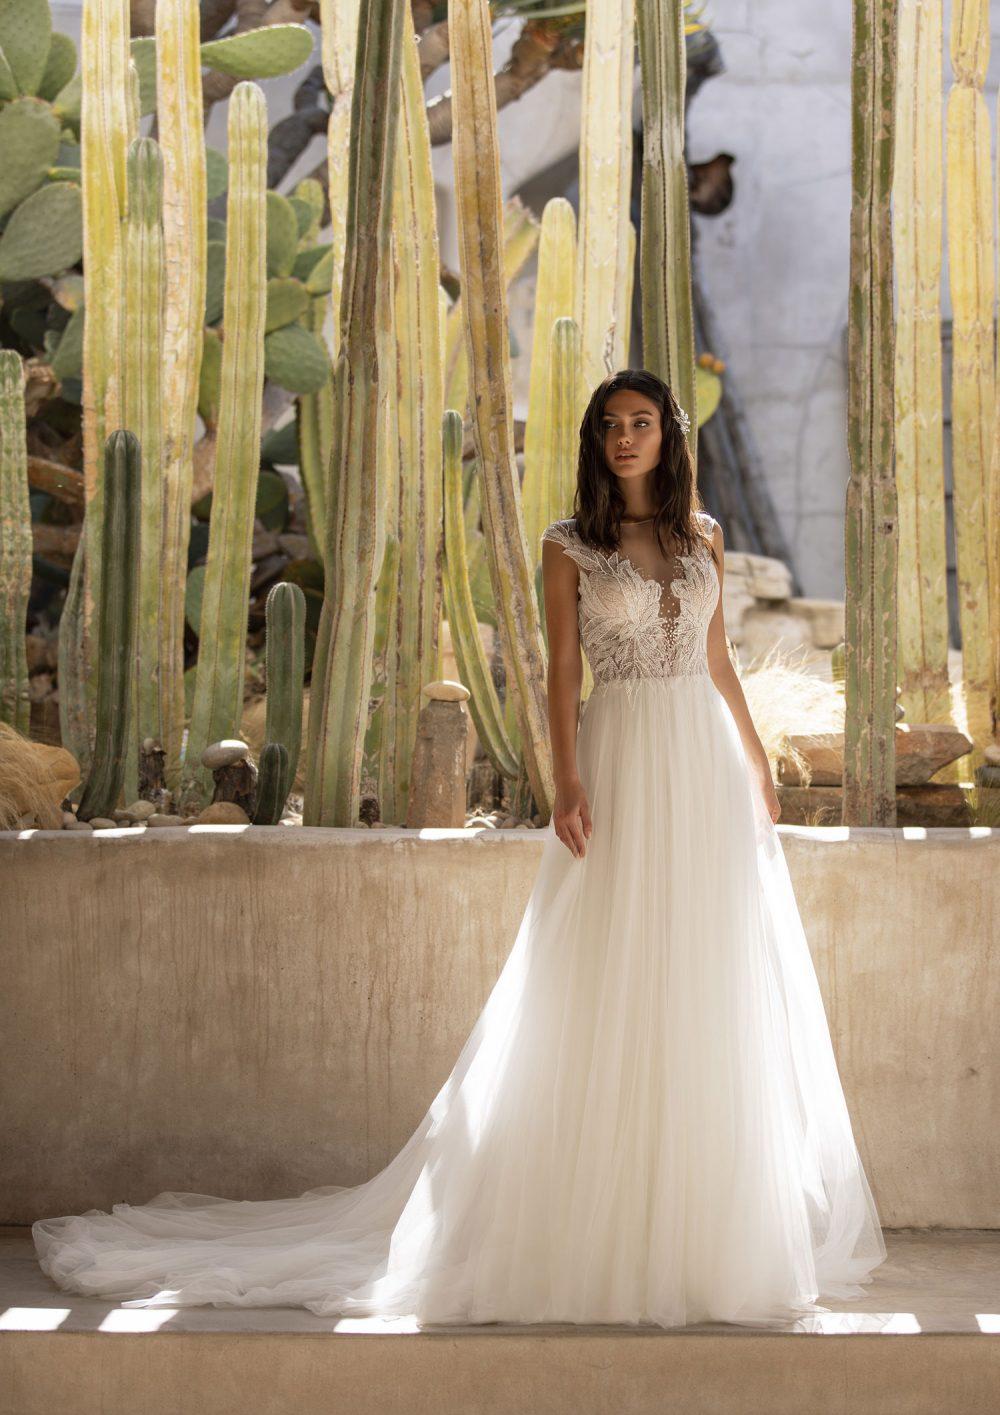 Mariages: abito da sposa Pronovias 2021 a Vicenza, Verona, Padova, Veneto MIRREN